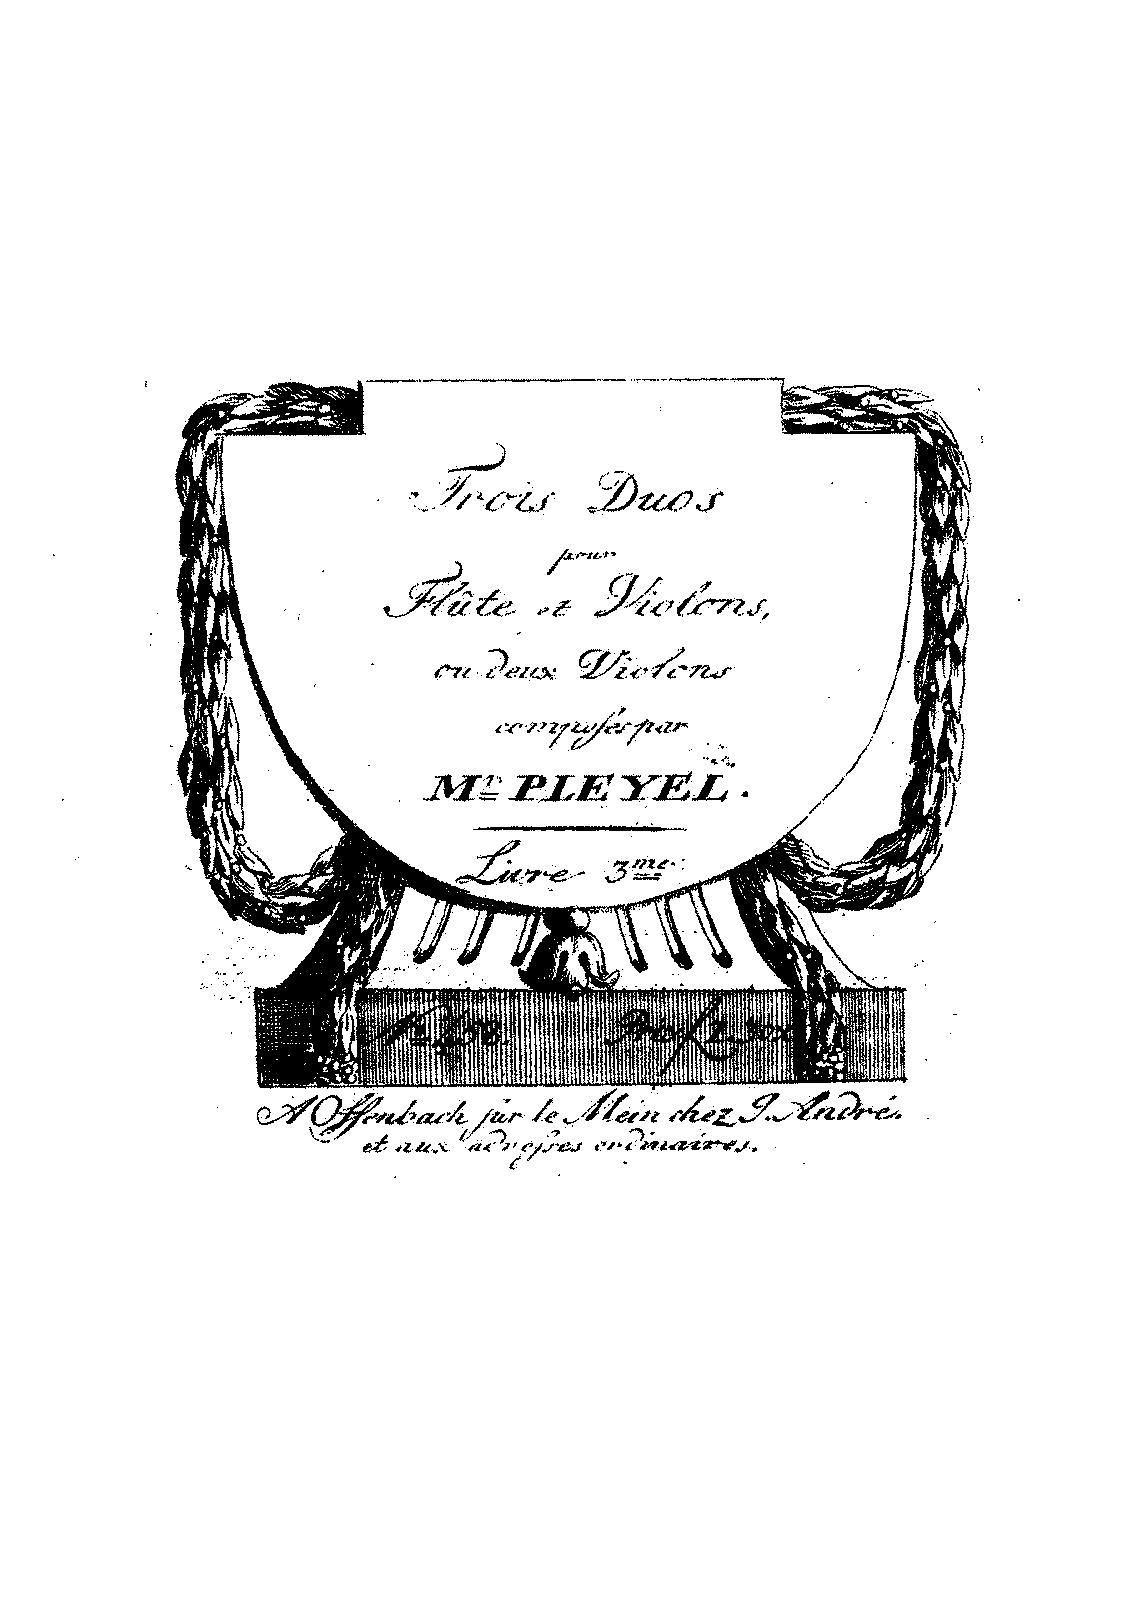 3 Duos For Flute And Violin B Pleyel Ignaz